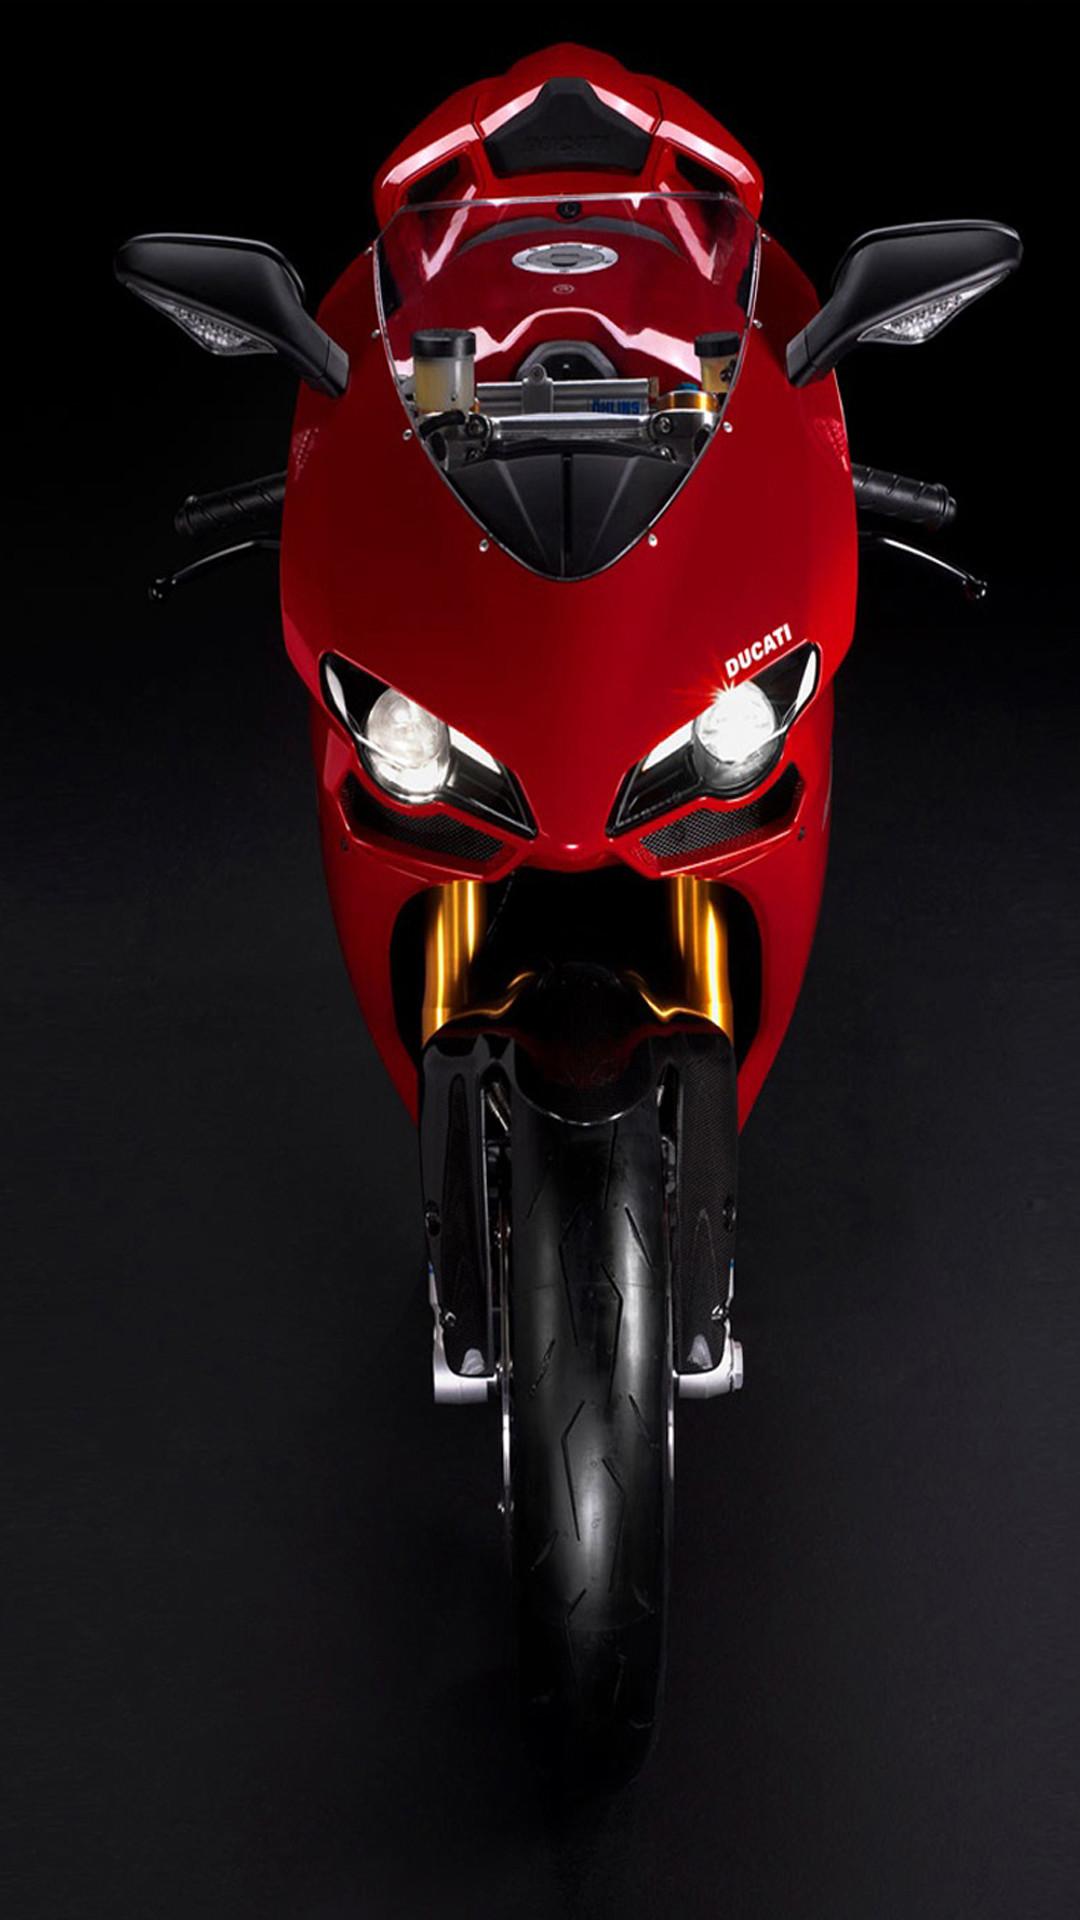 Ducati 1198 Superbike Red iPhone 6 Plus HD Wallpaper …